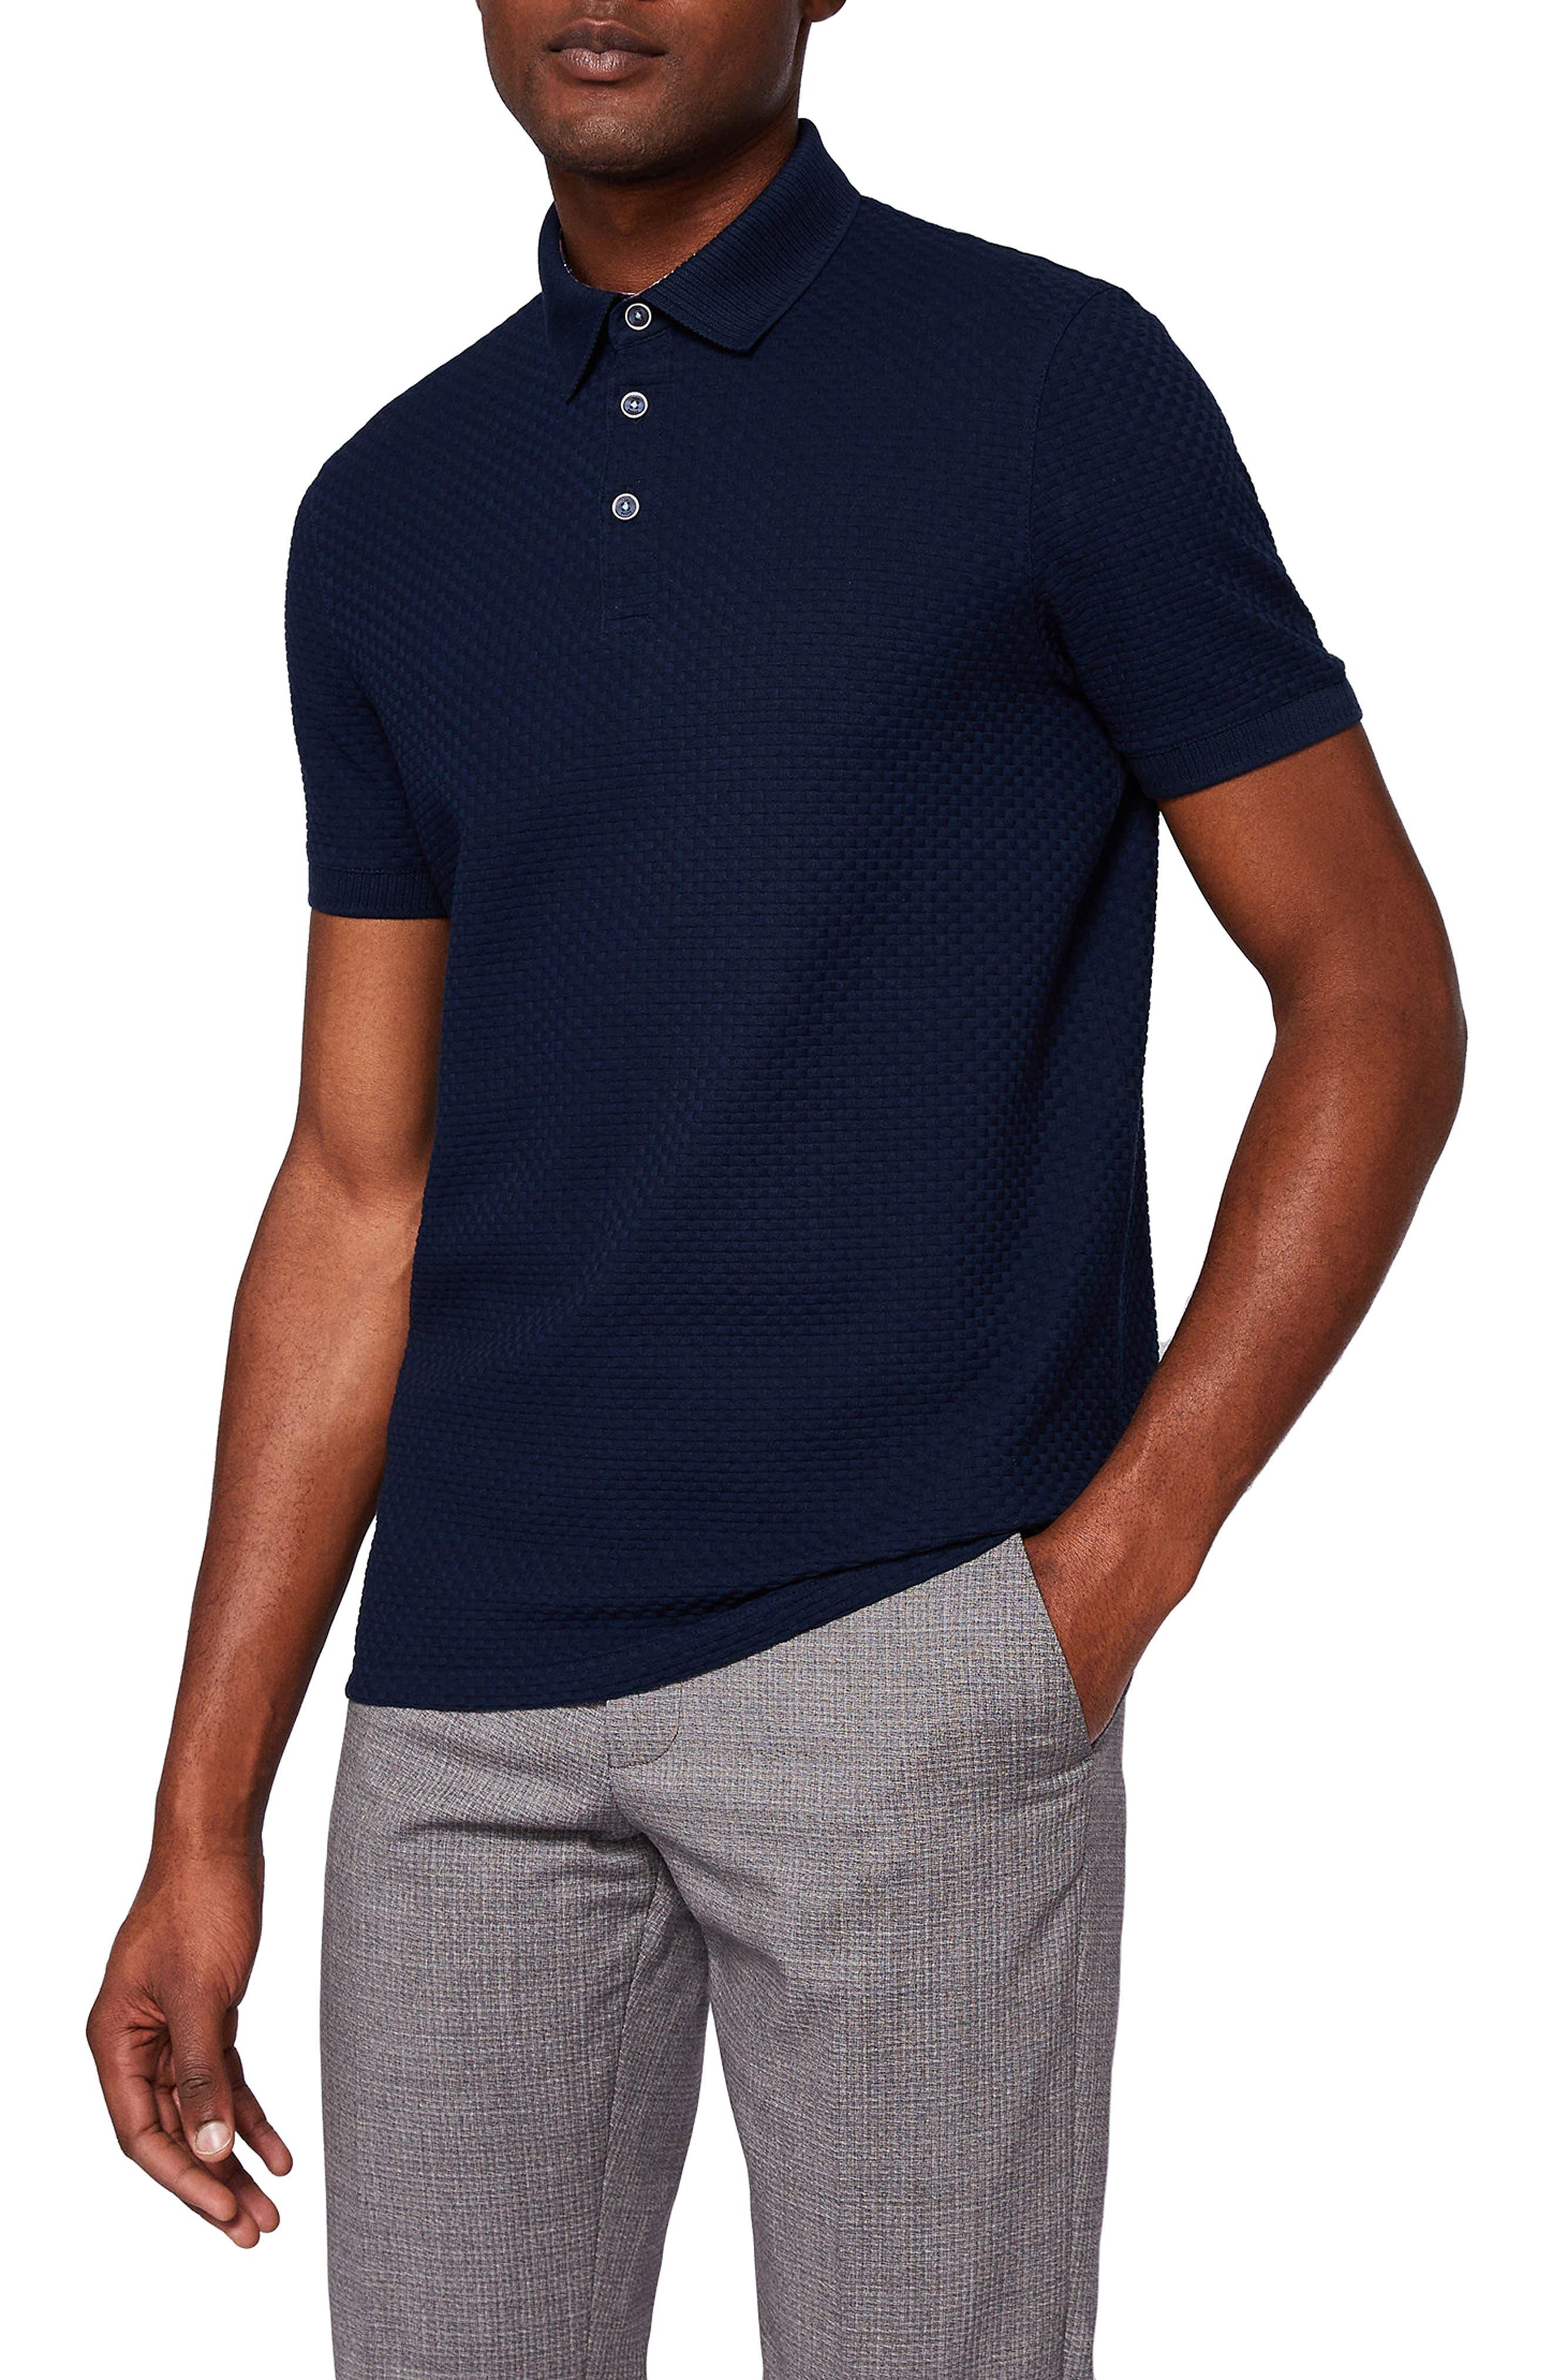 Eskimtt Polo Shirt,                             Main thumbnail 1, color,